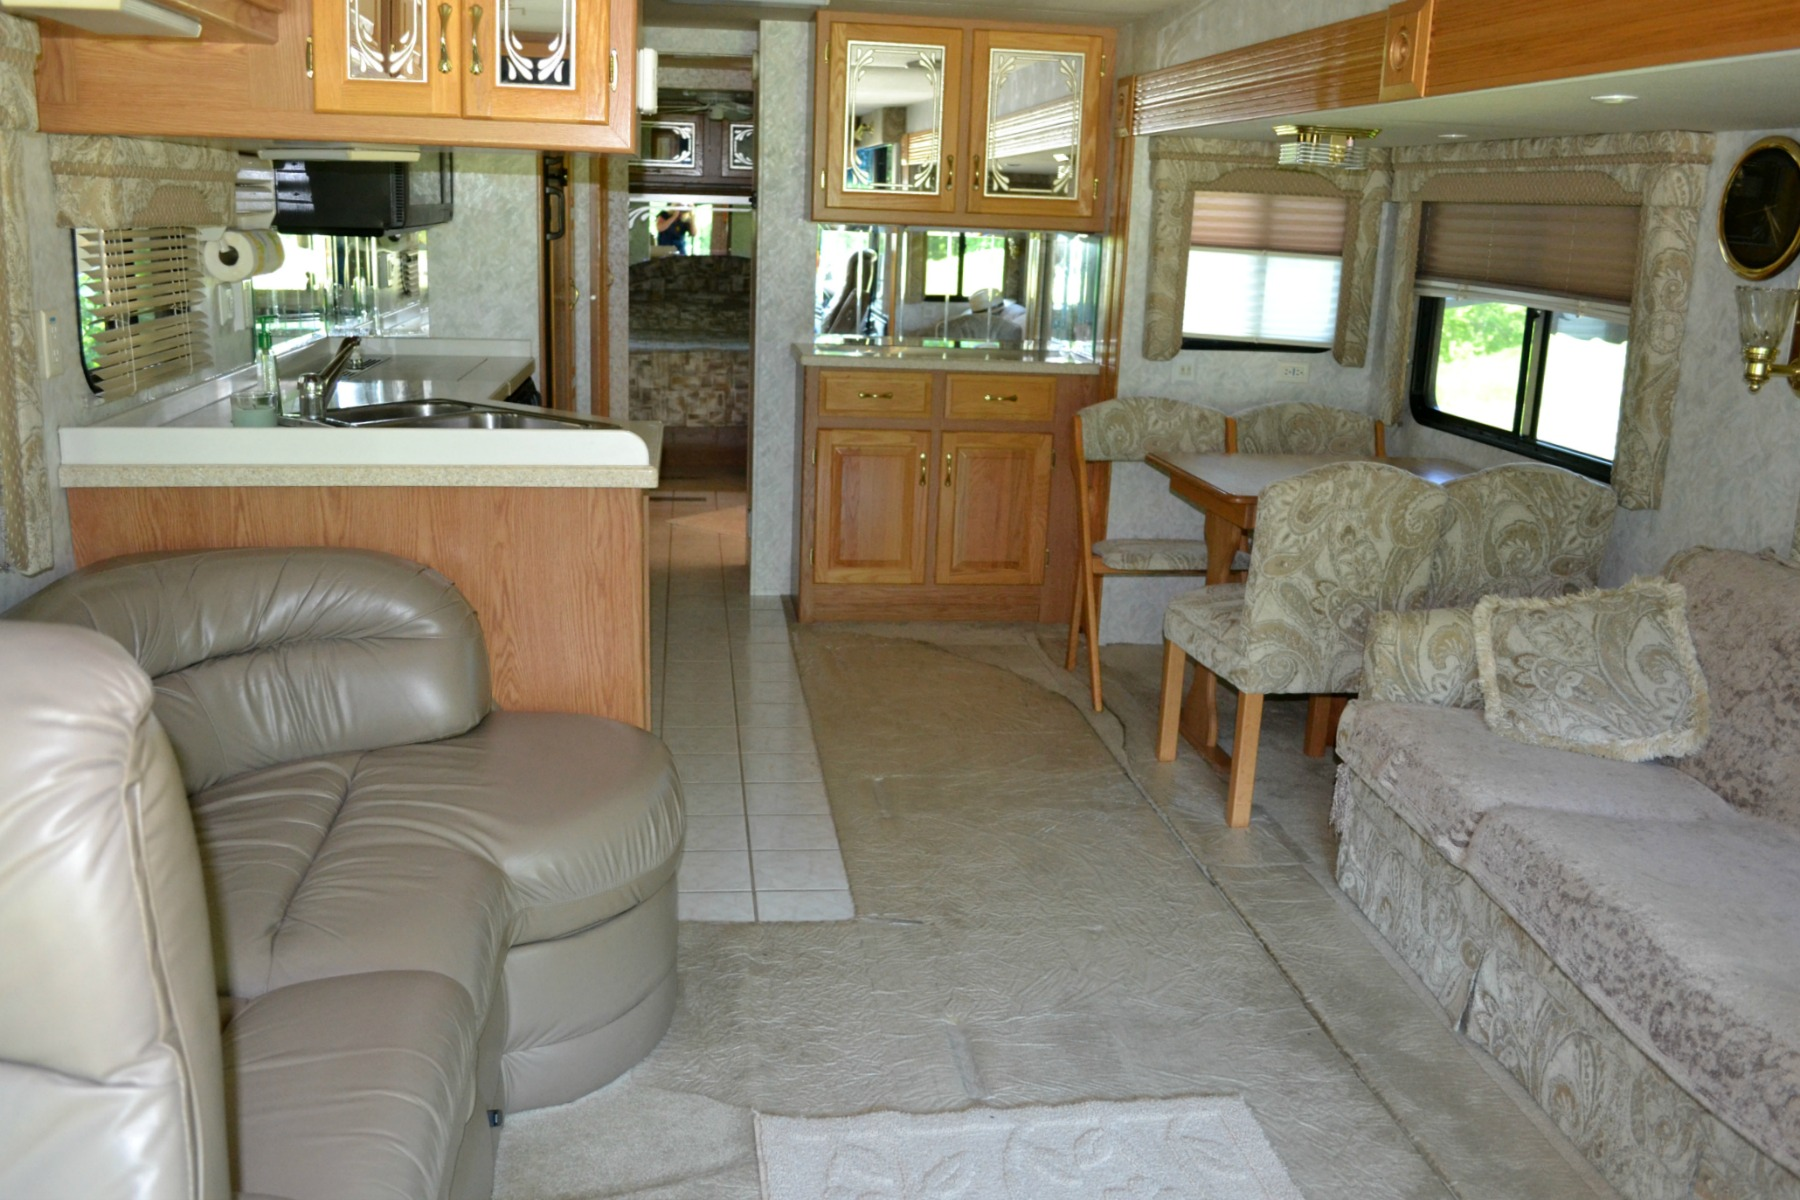 rv travel, camping, inside rv